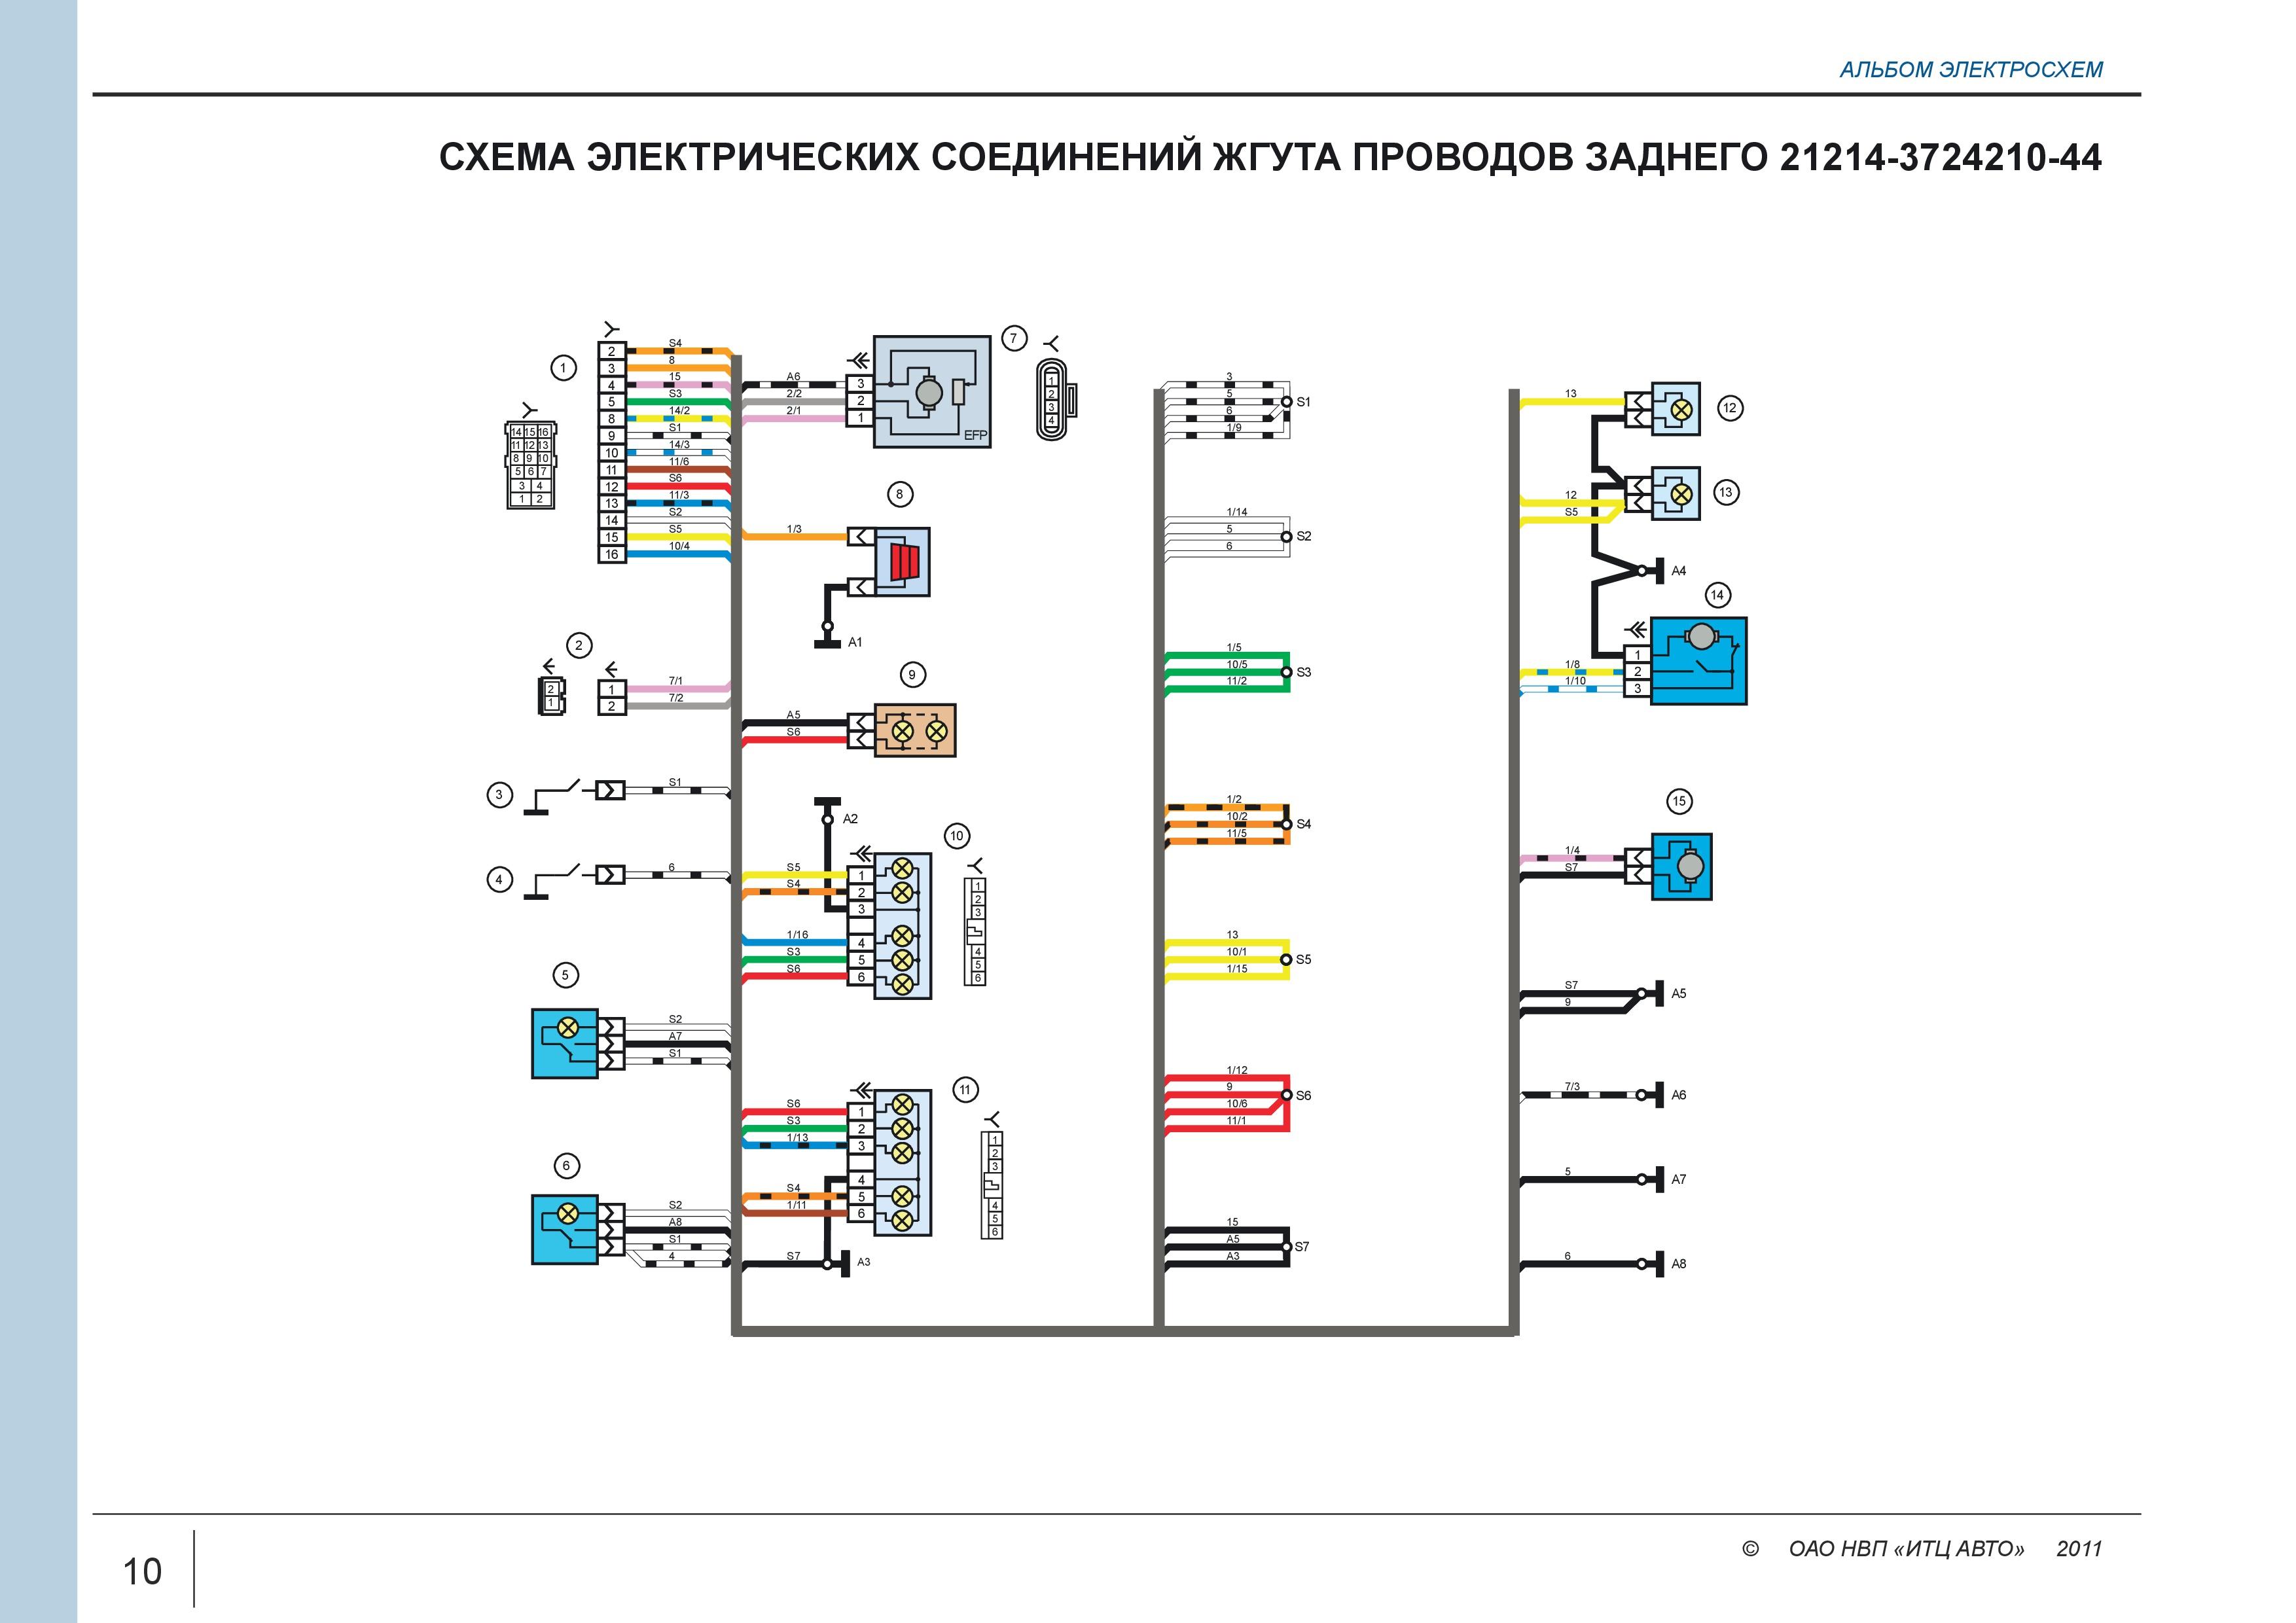 niva elektroshema4 - Электрическая схема ваз 2131 нива инжектор